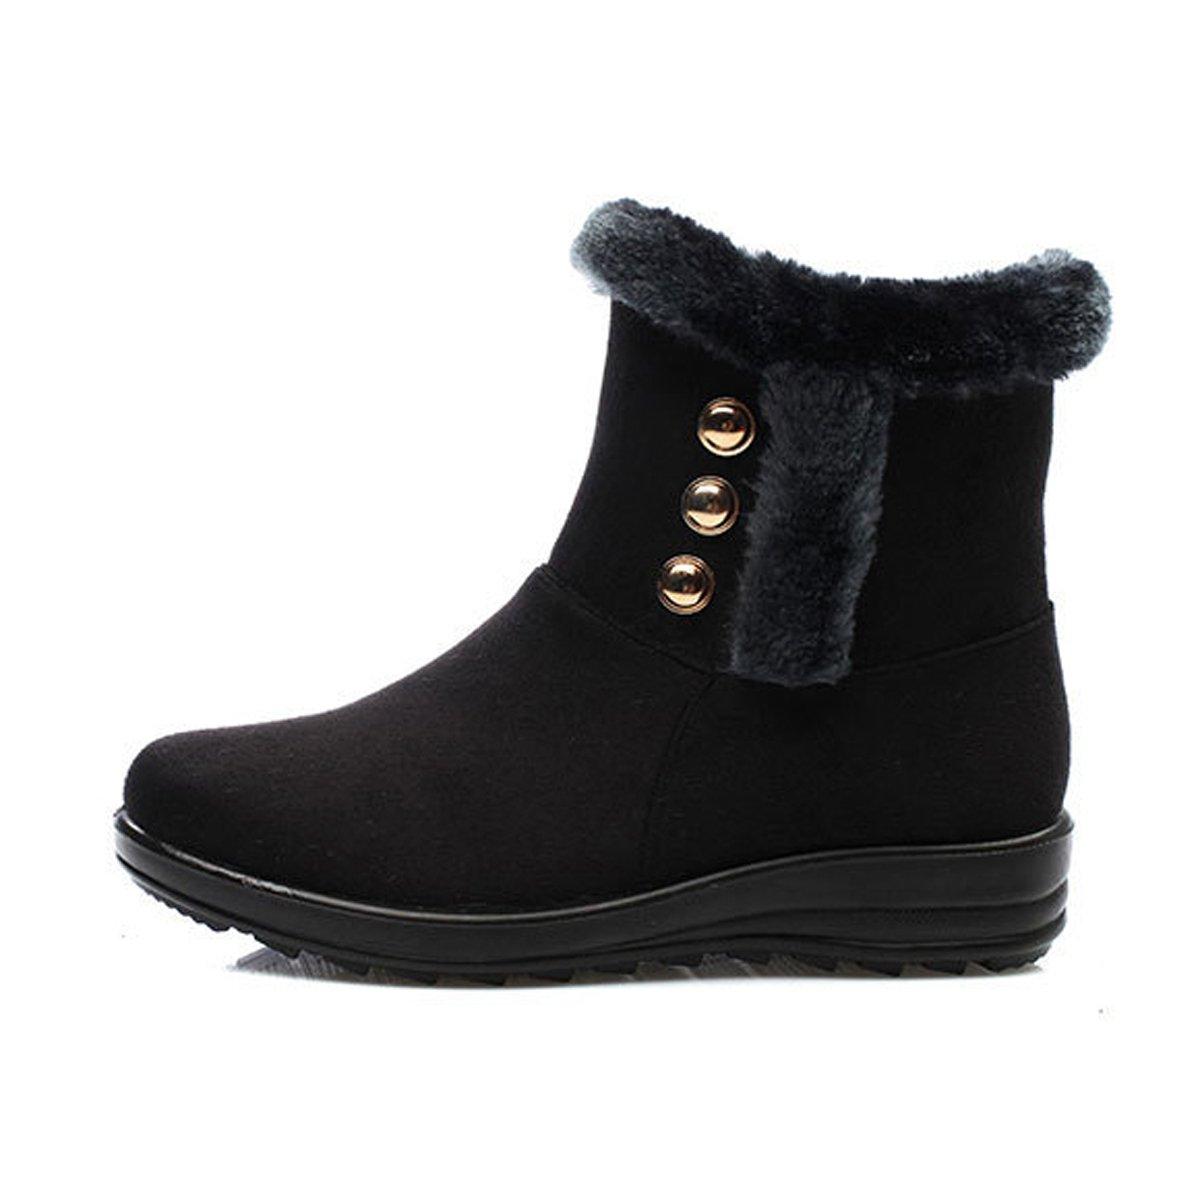 Dear Time Women Winter Warm Button Snow Boots (US 8, Black Rivet)